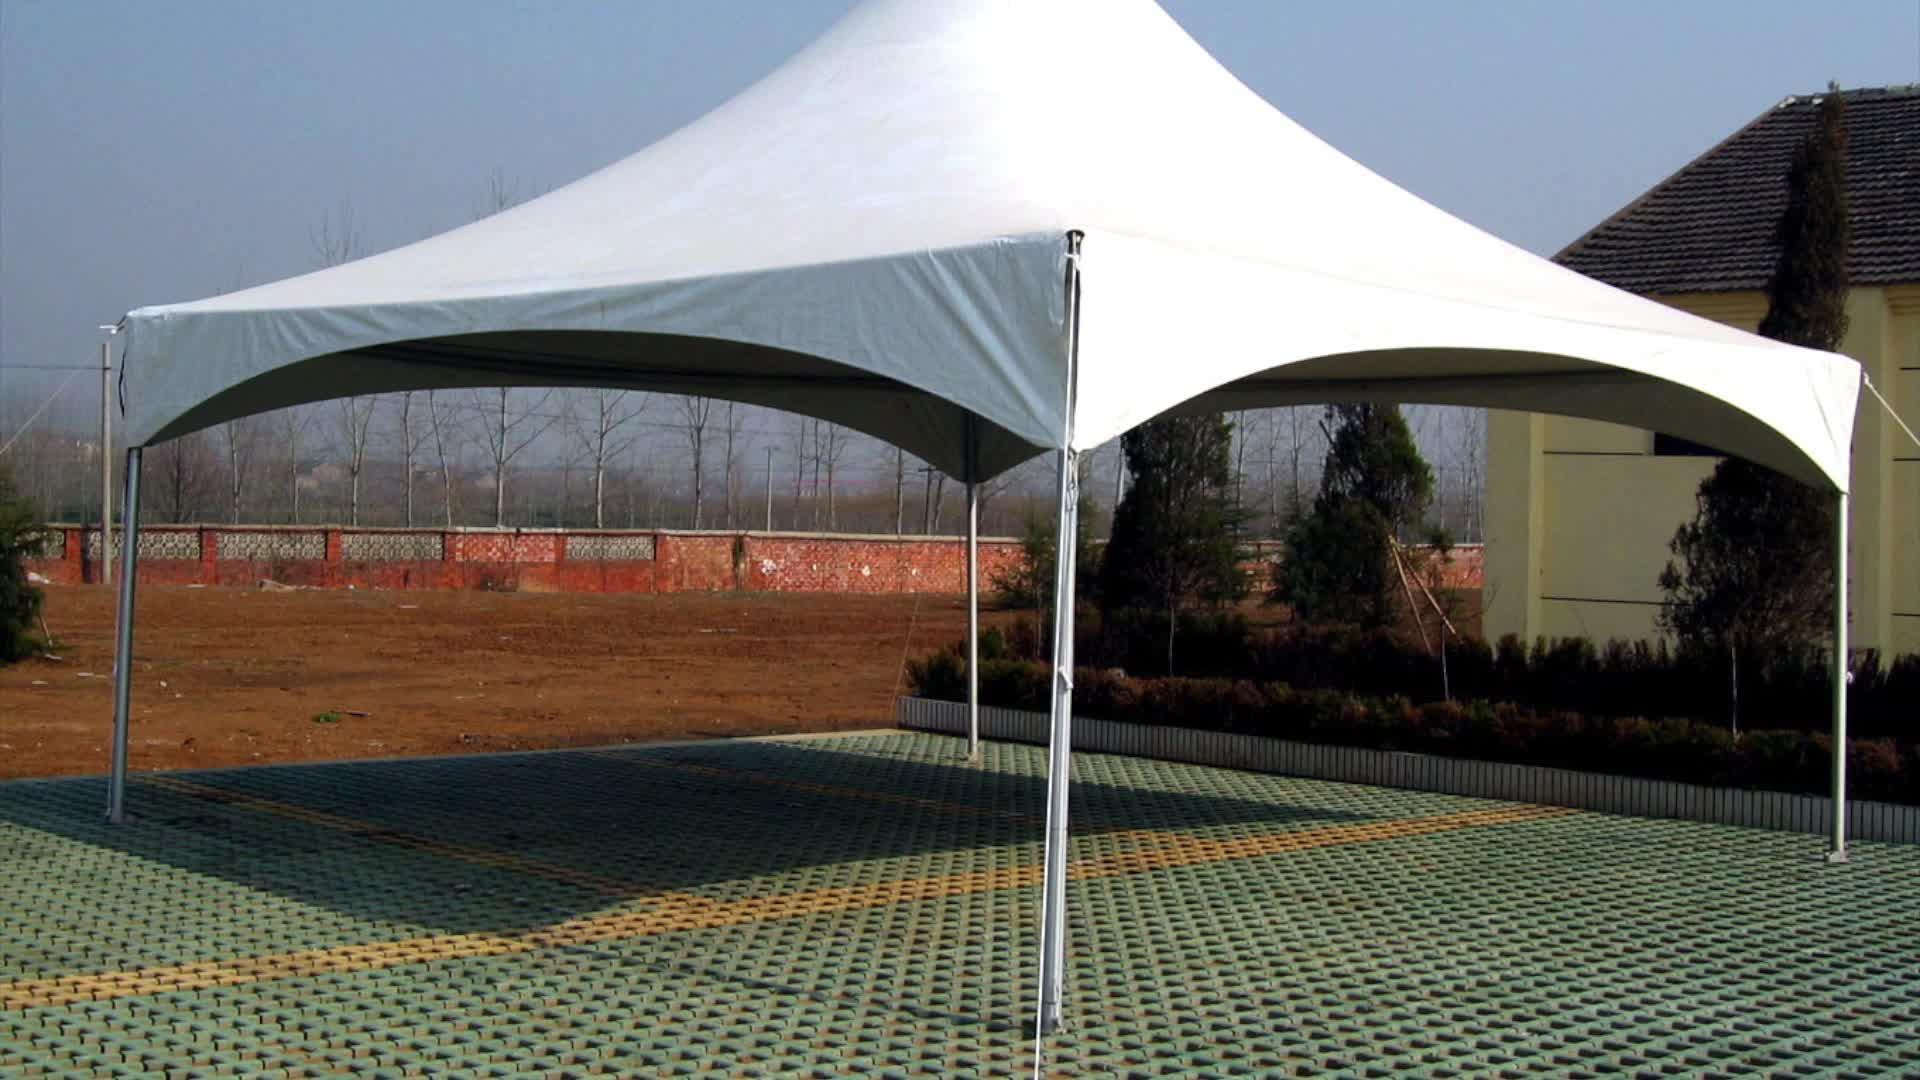 Professionele Fabrikant Pergola Carport Marquee Tenten Voor Auto Parkeerplaats Luifel